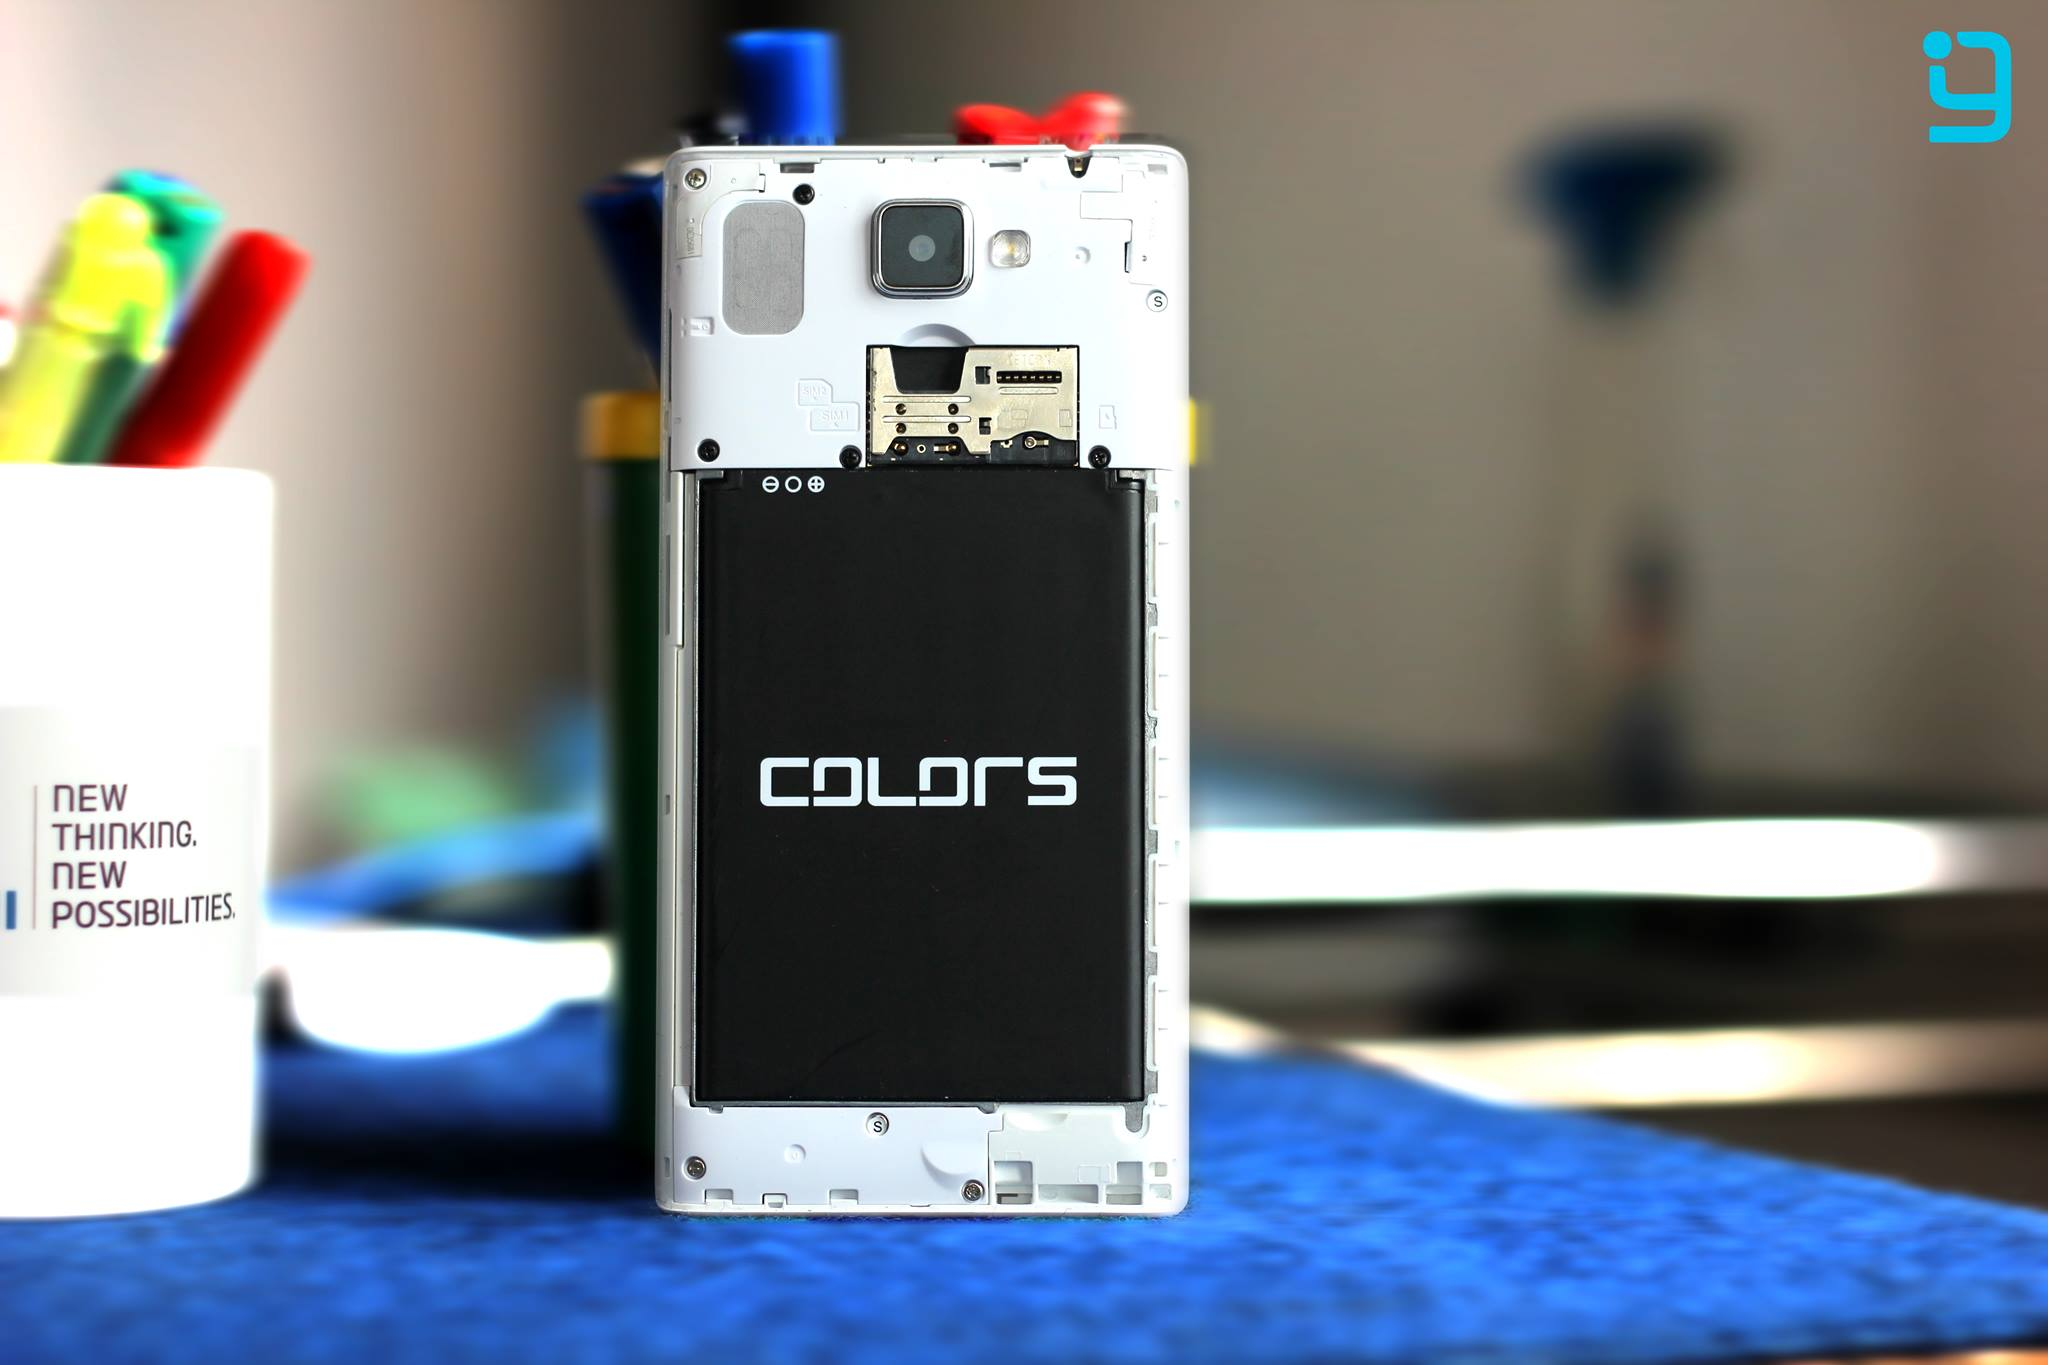 colors pride p80 battery